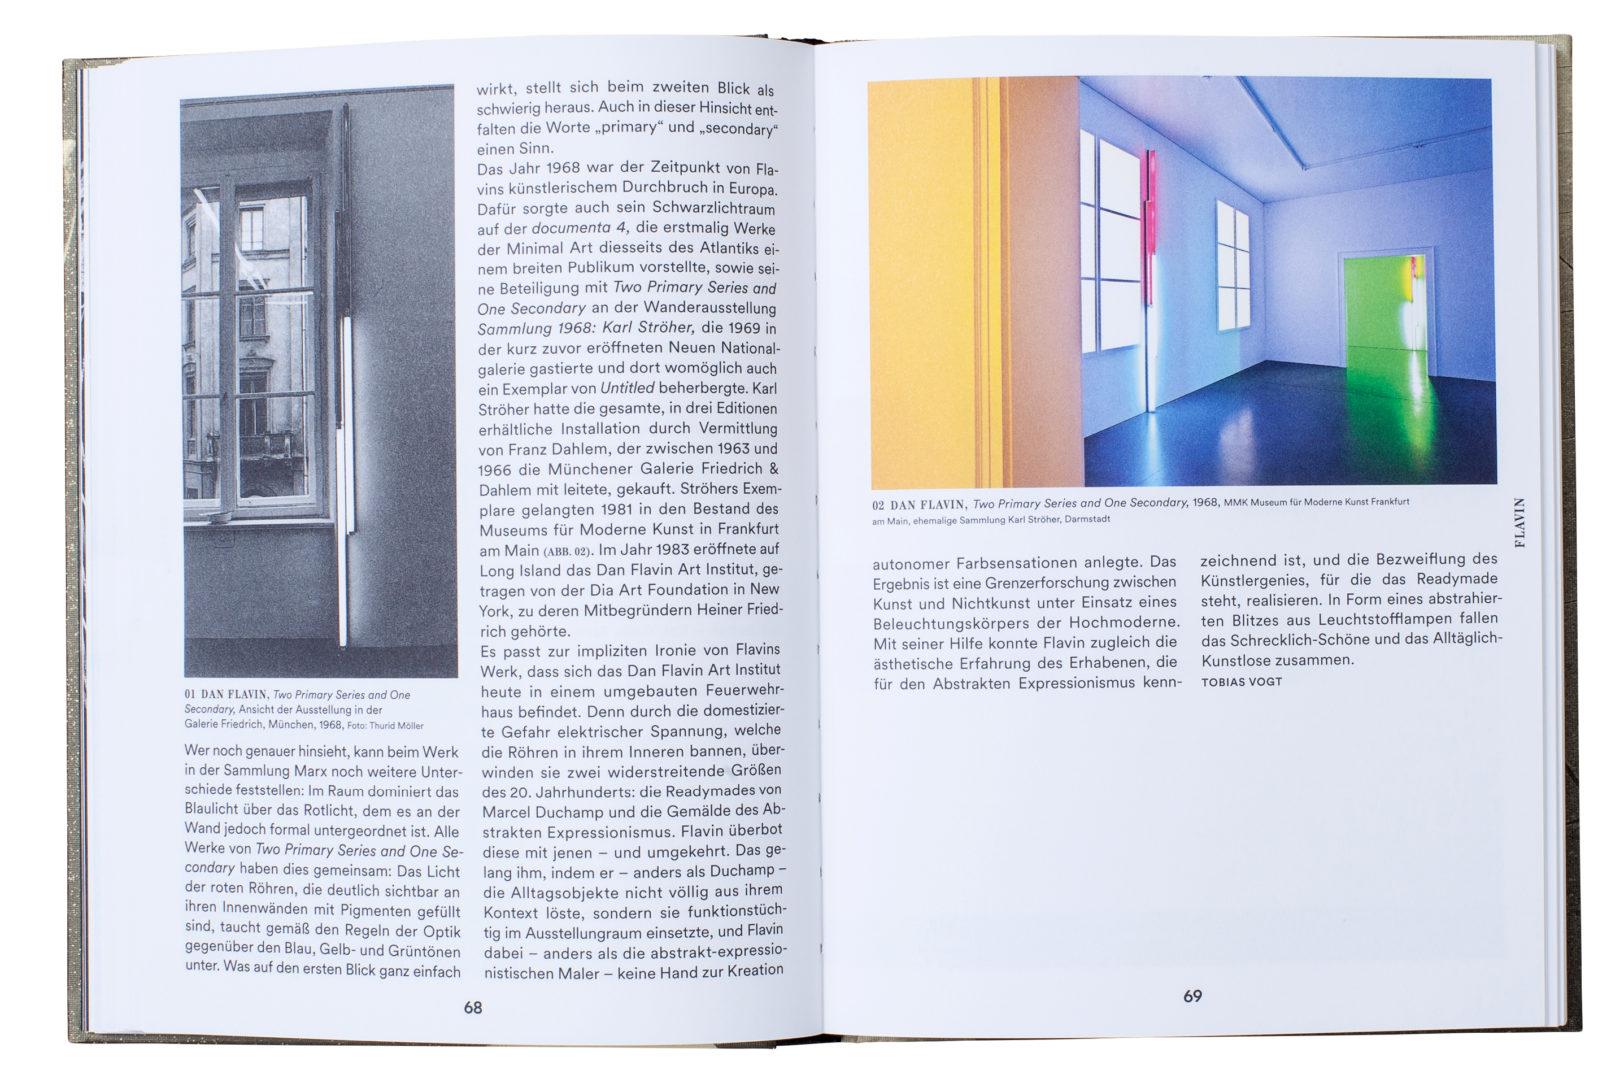 http://e-o-t.de/wordpress/wp-content/uploads/2020/06/Books-Marx-eot16.jpg